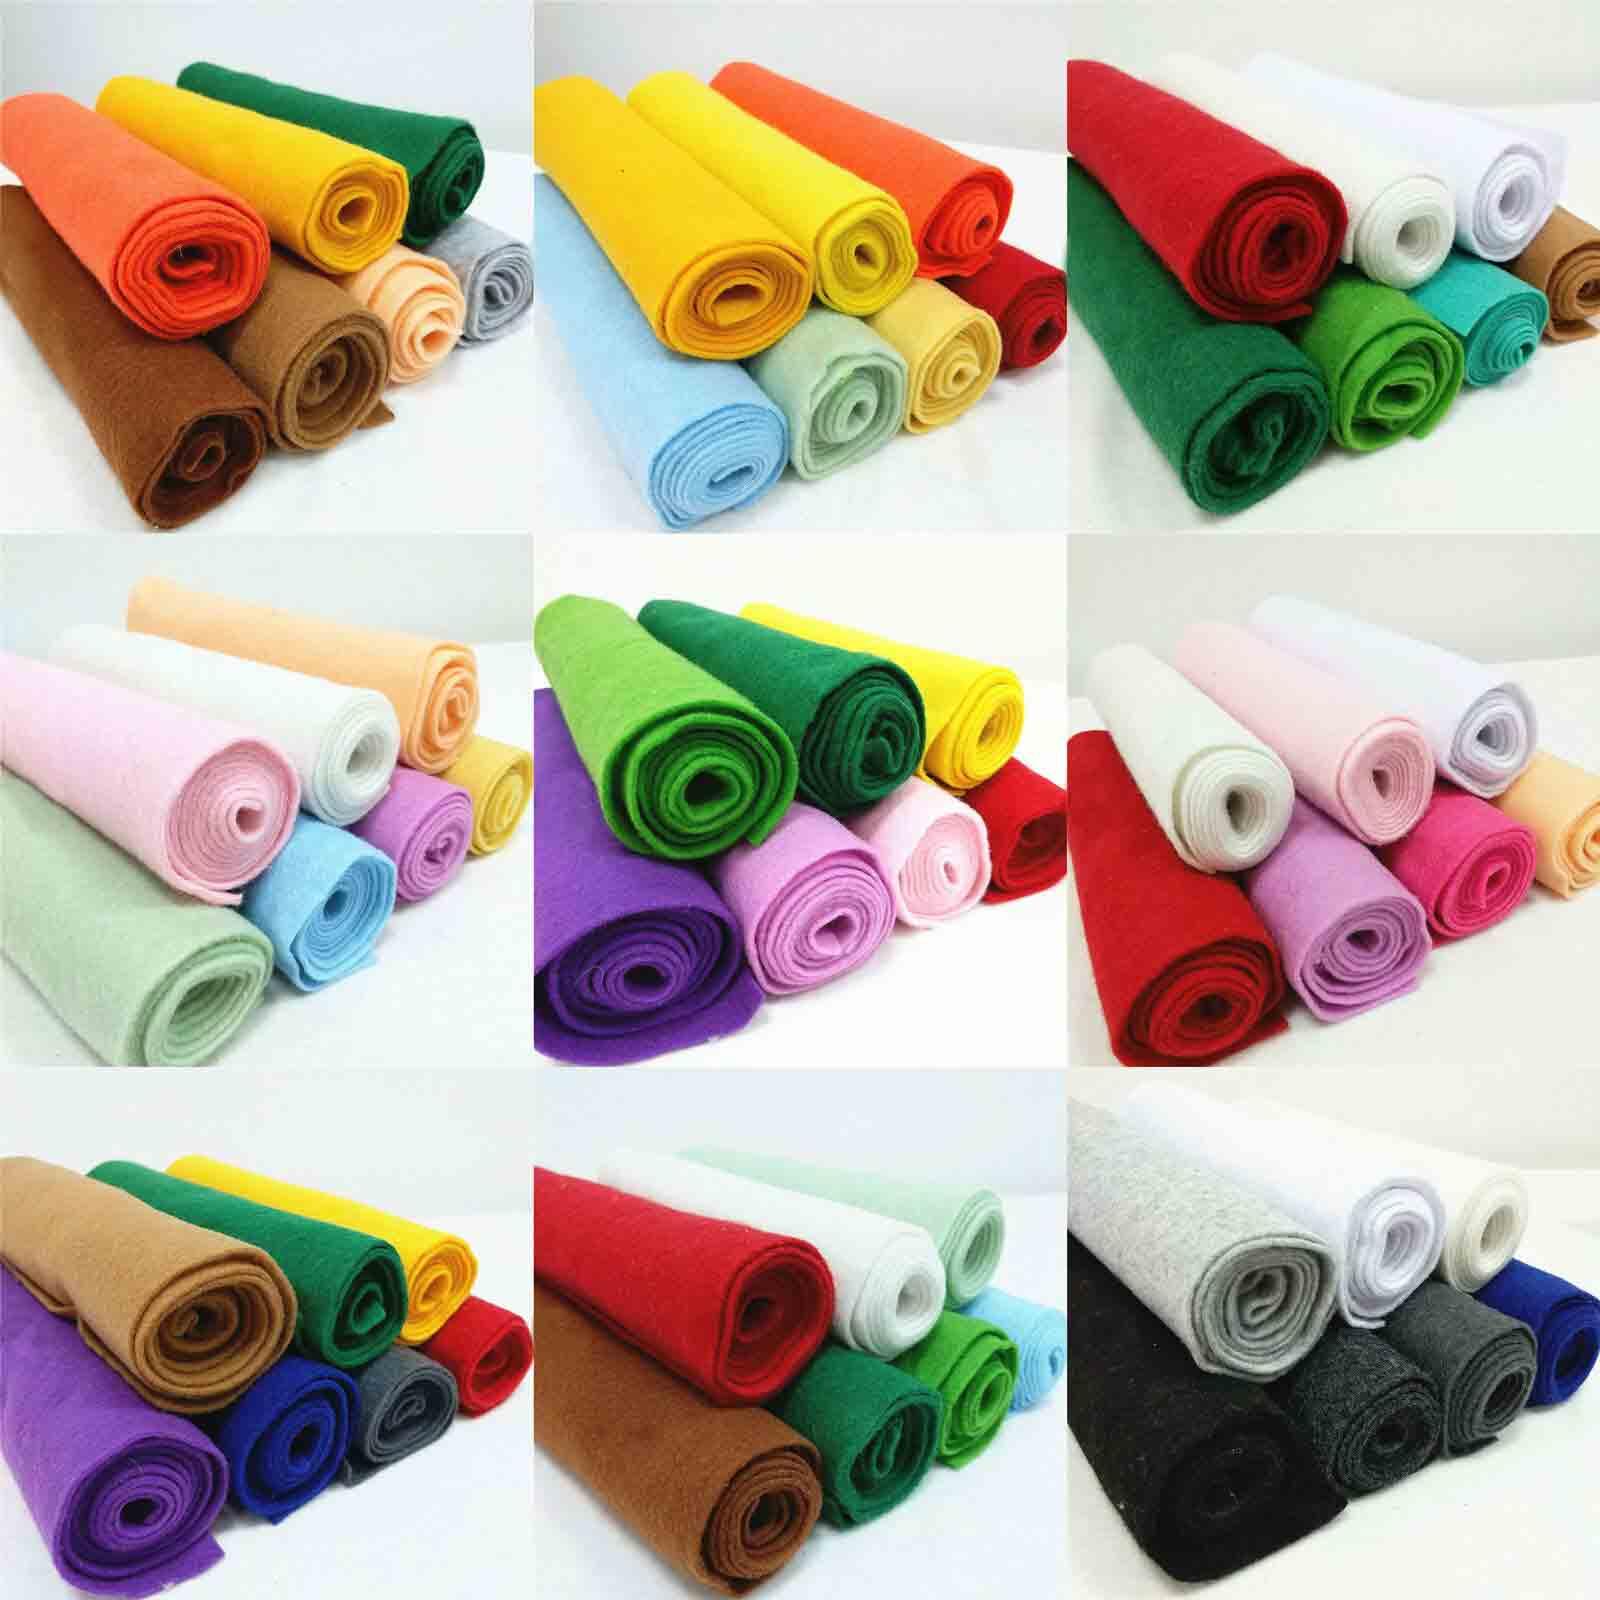 rolls of felt fabric